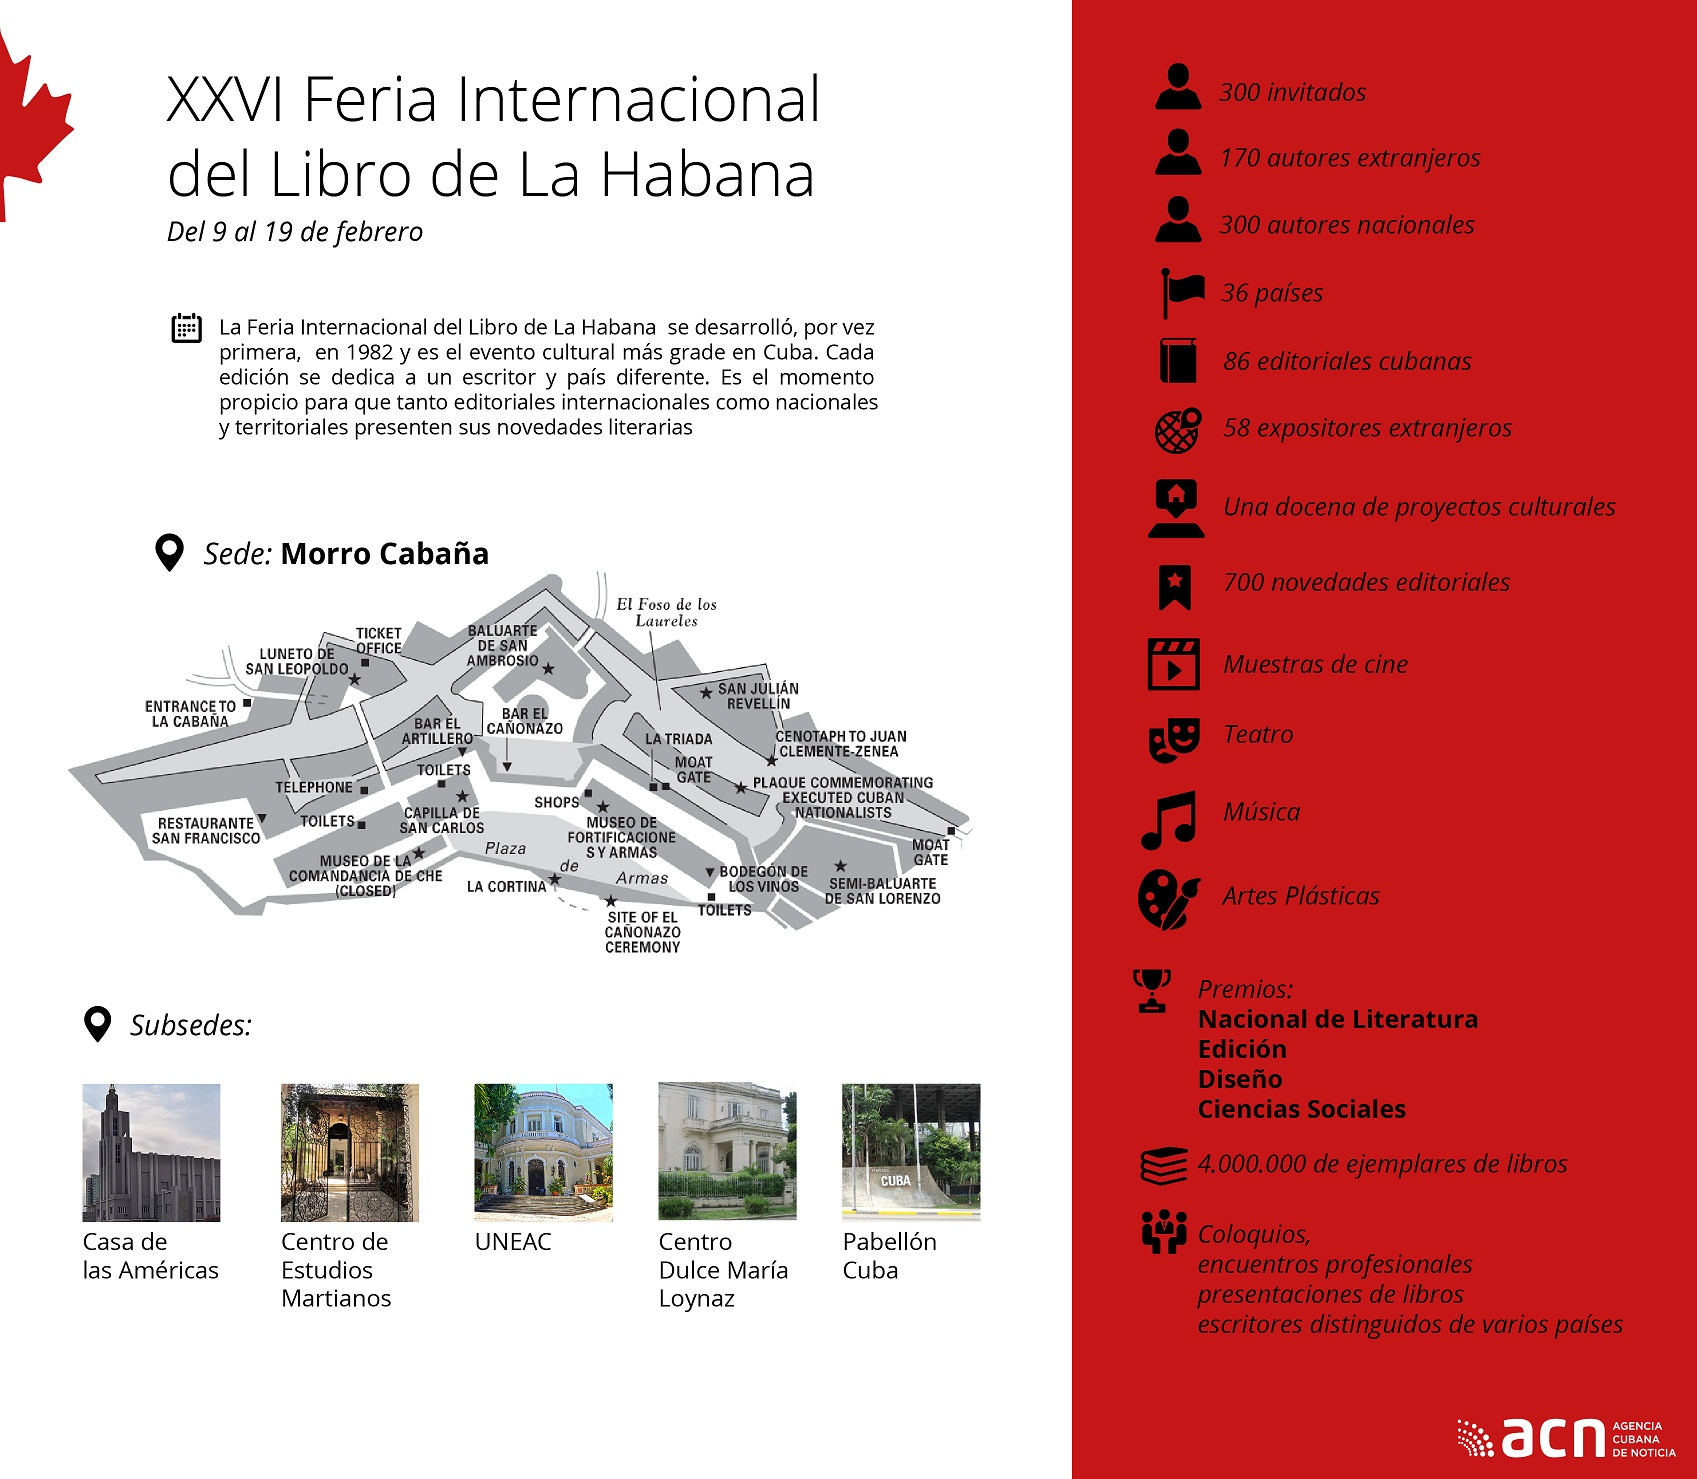 http://www.acn.cu/images/2017/febrero/infografia-feria-libro-010.jpg